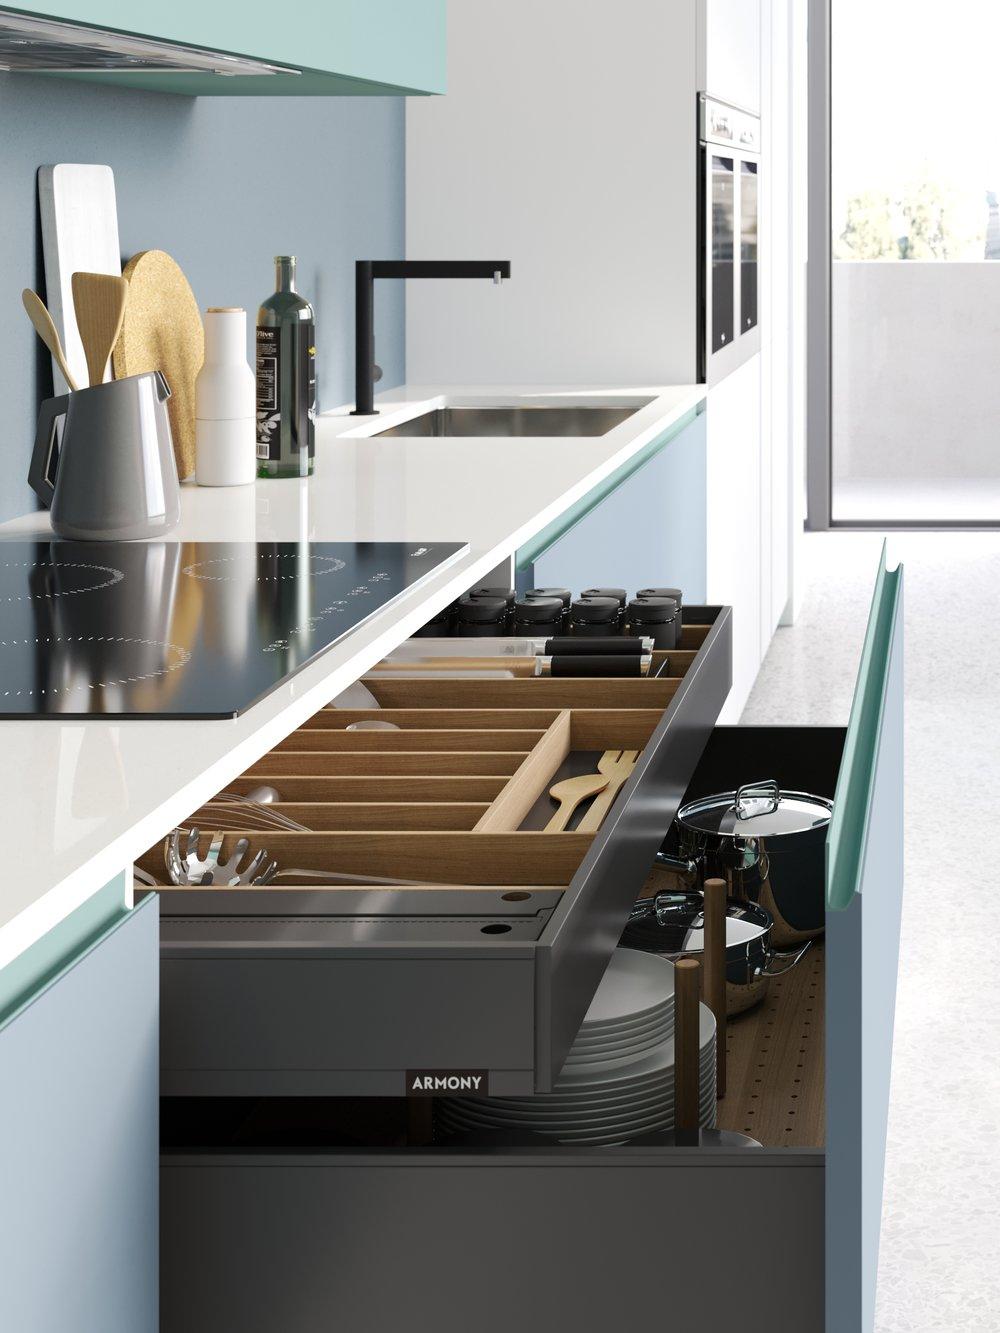 19008-ARM-S19-02-Concrete minimalism-04-de-v.jpg